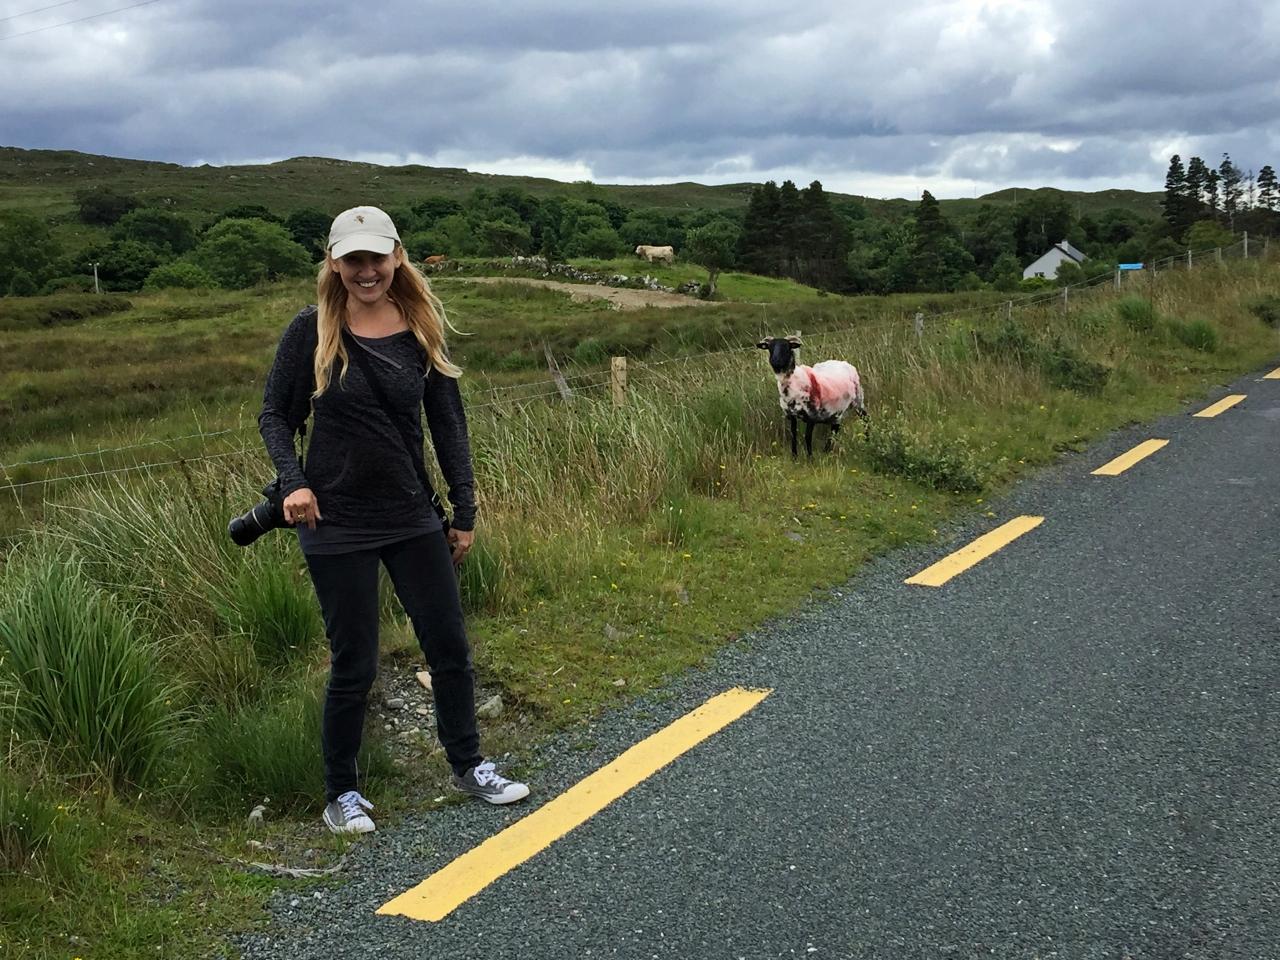 Taking photos of sheep in Ireland